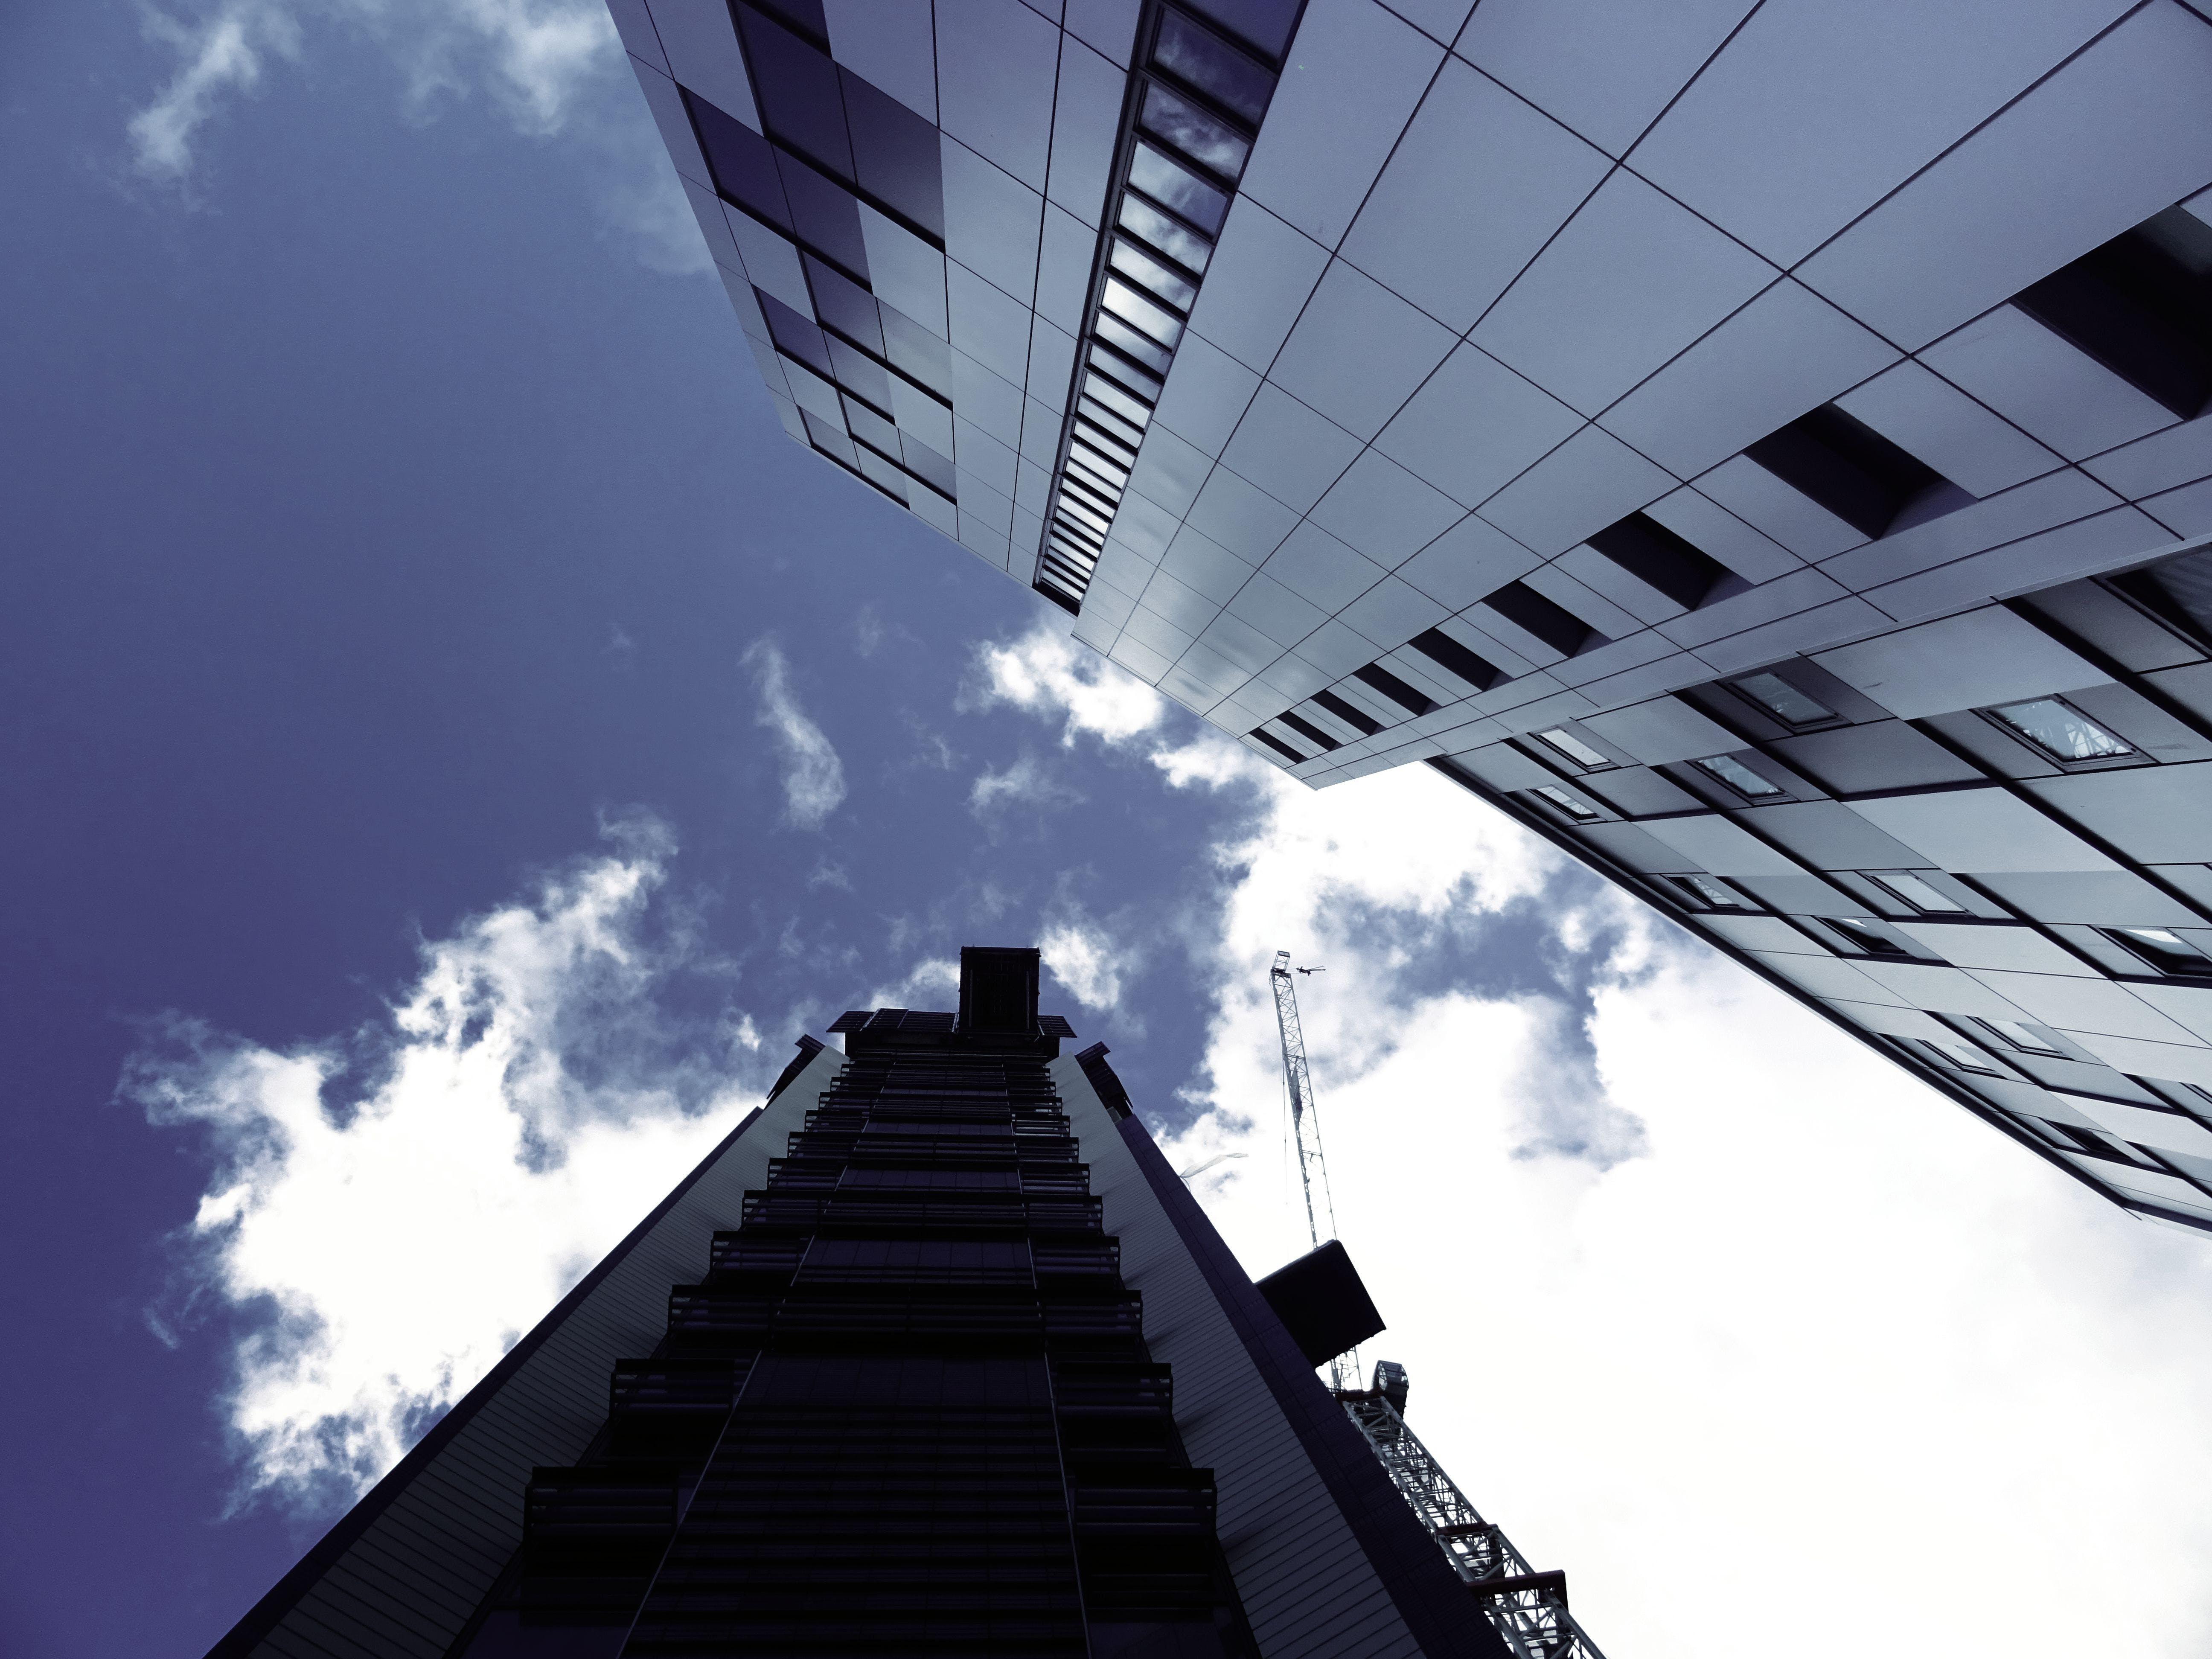 Buildings Under Cloudy Sky